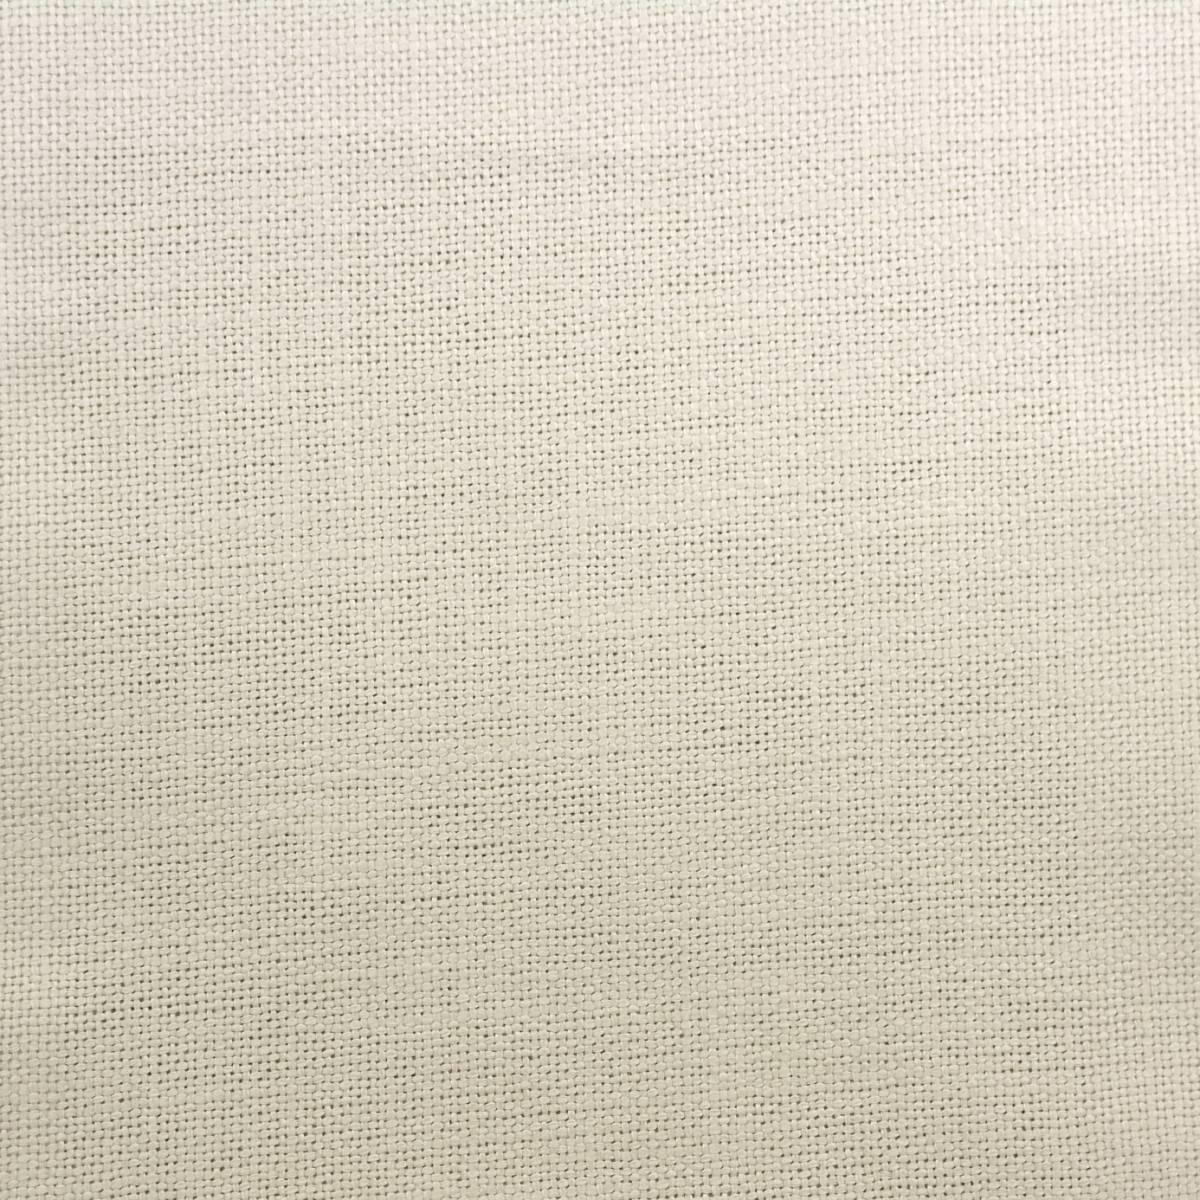 Almora Plain Fabric Beige 36641138 Camengo Almora